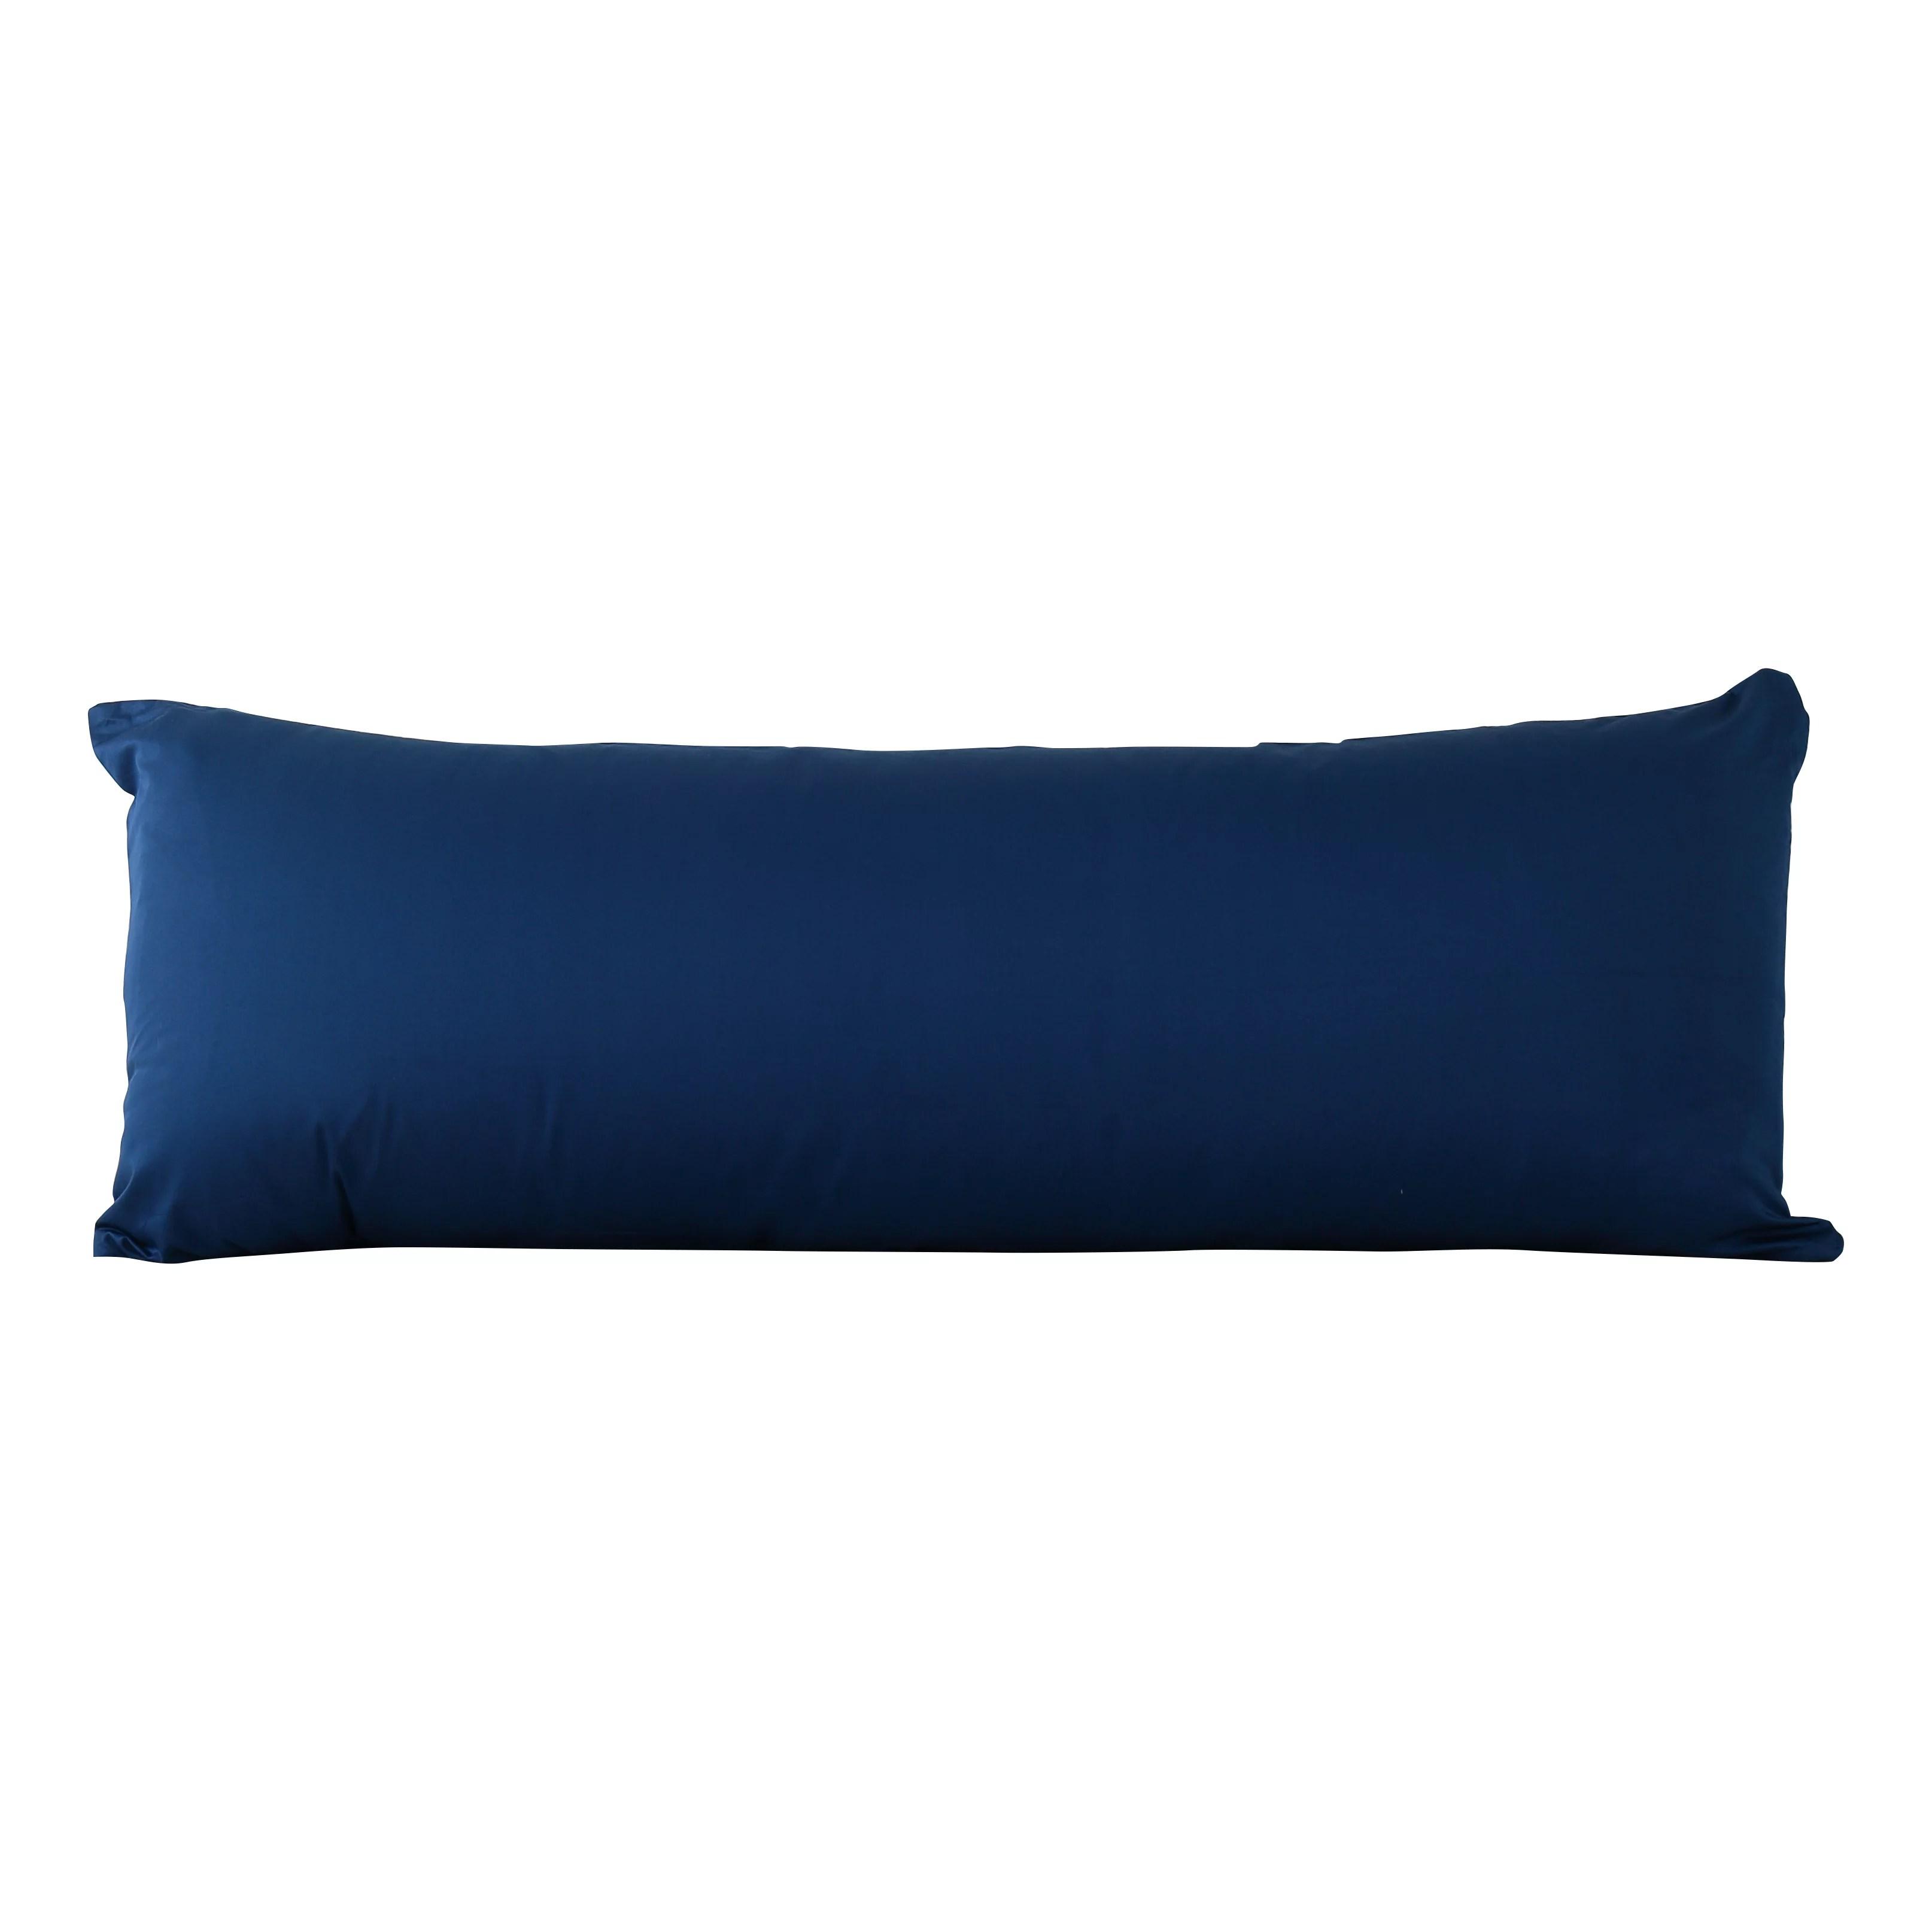 evolive 300tc 100 cotton body pillow cover with zipper closure 21 x54